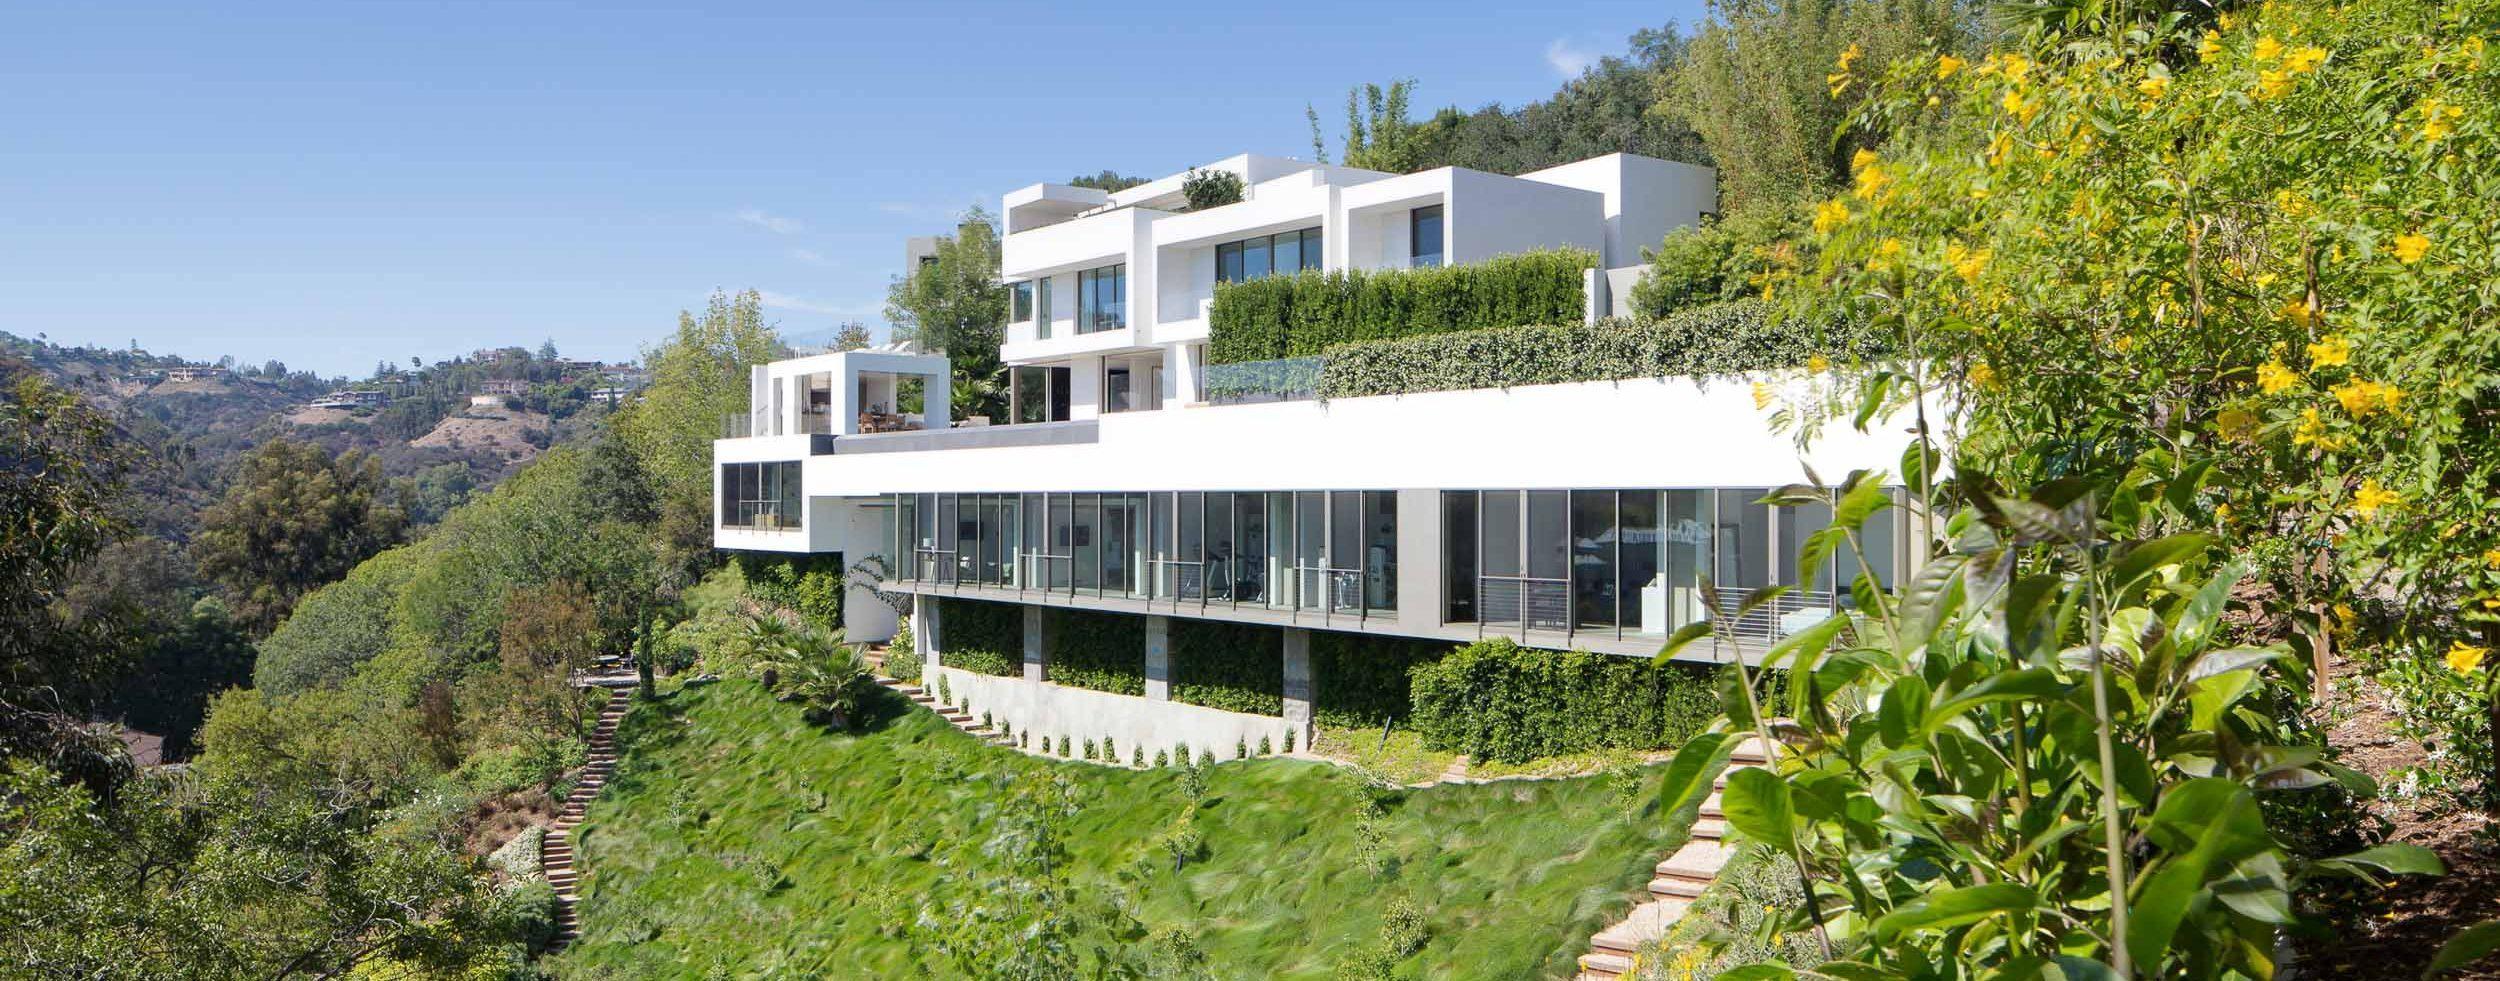 large white modern home on steep slope